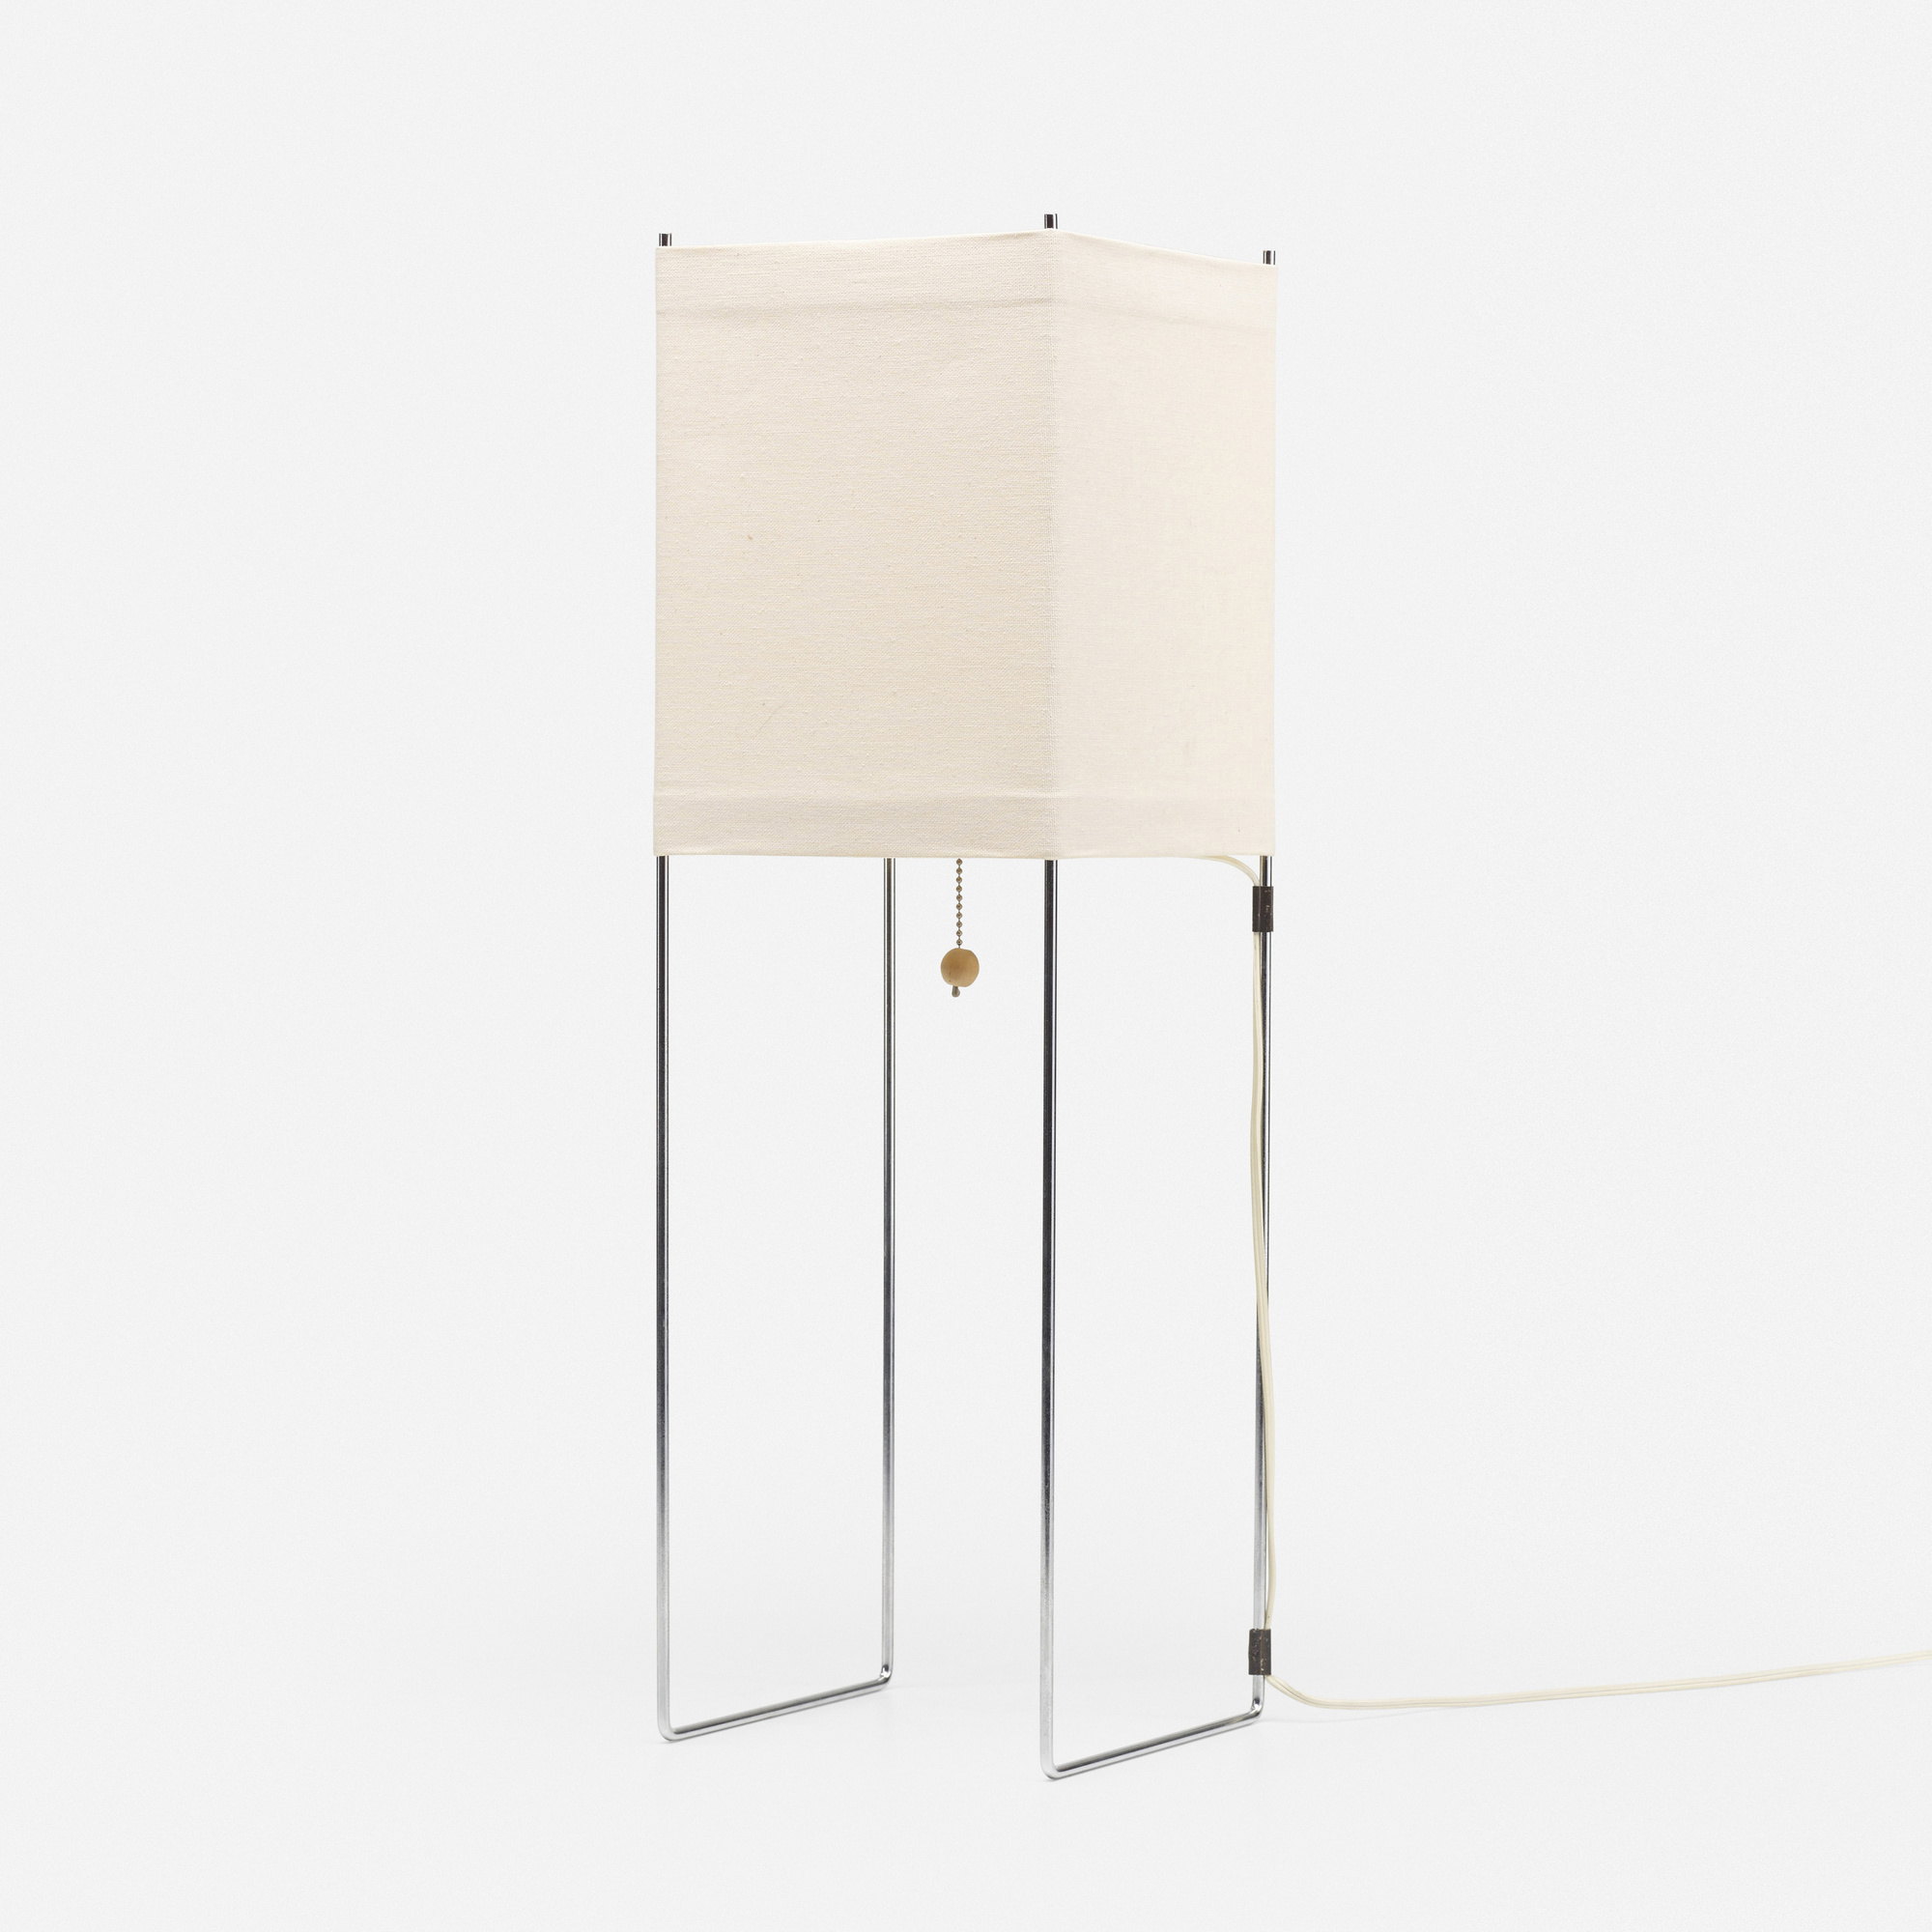 768: Gregory van Pelt / Wireworks 1 floor lamp (1 of 1)